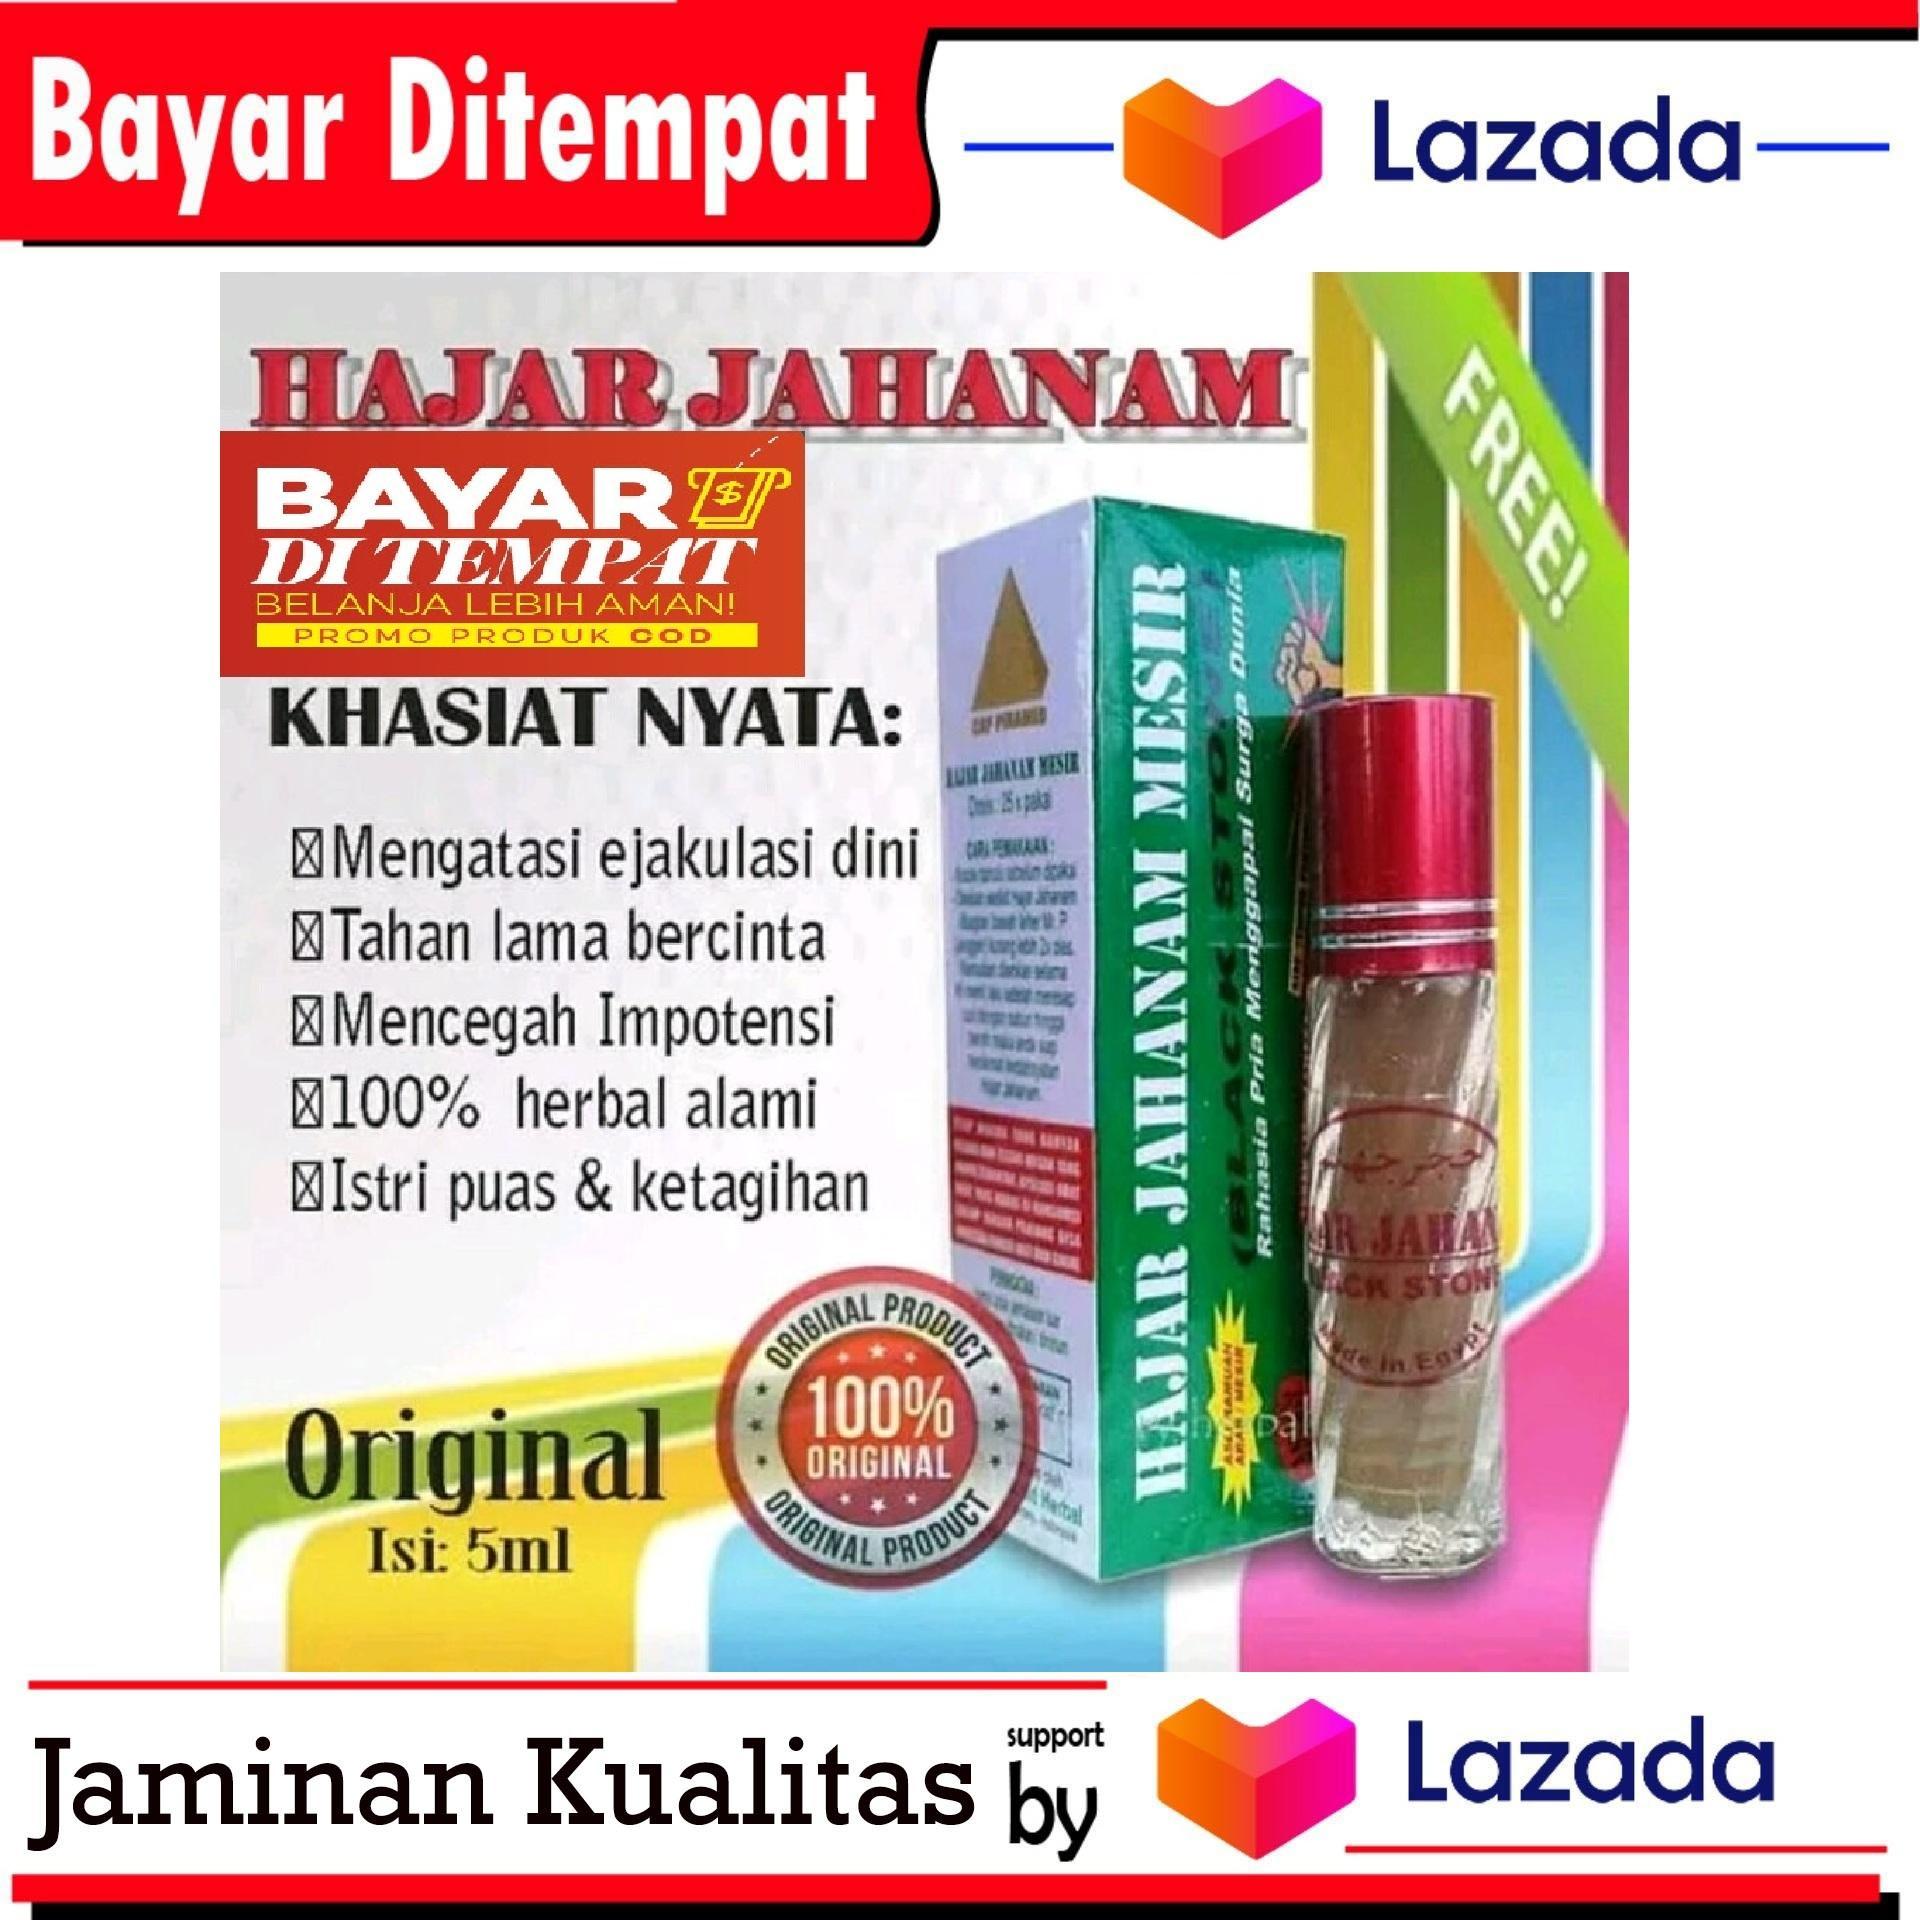 minyak oleh herbal hajar_jahanam_mesir asli original mesir  untuk 1 pcs bukan 1 box